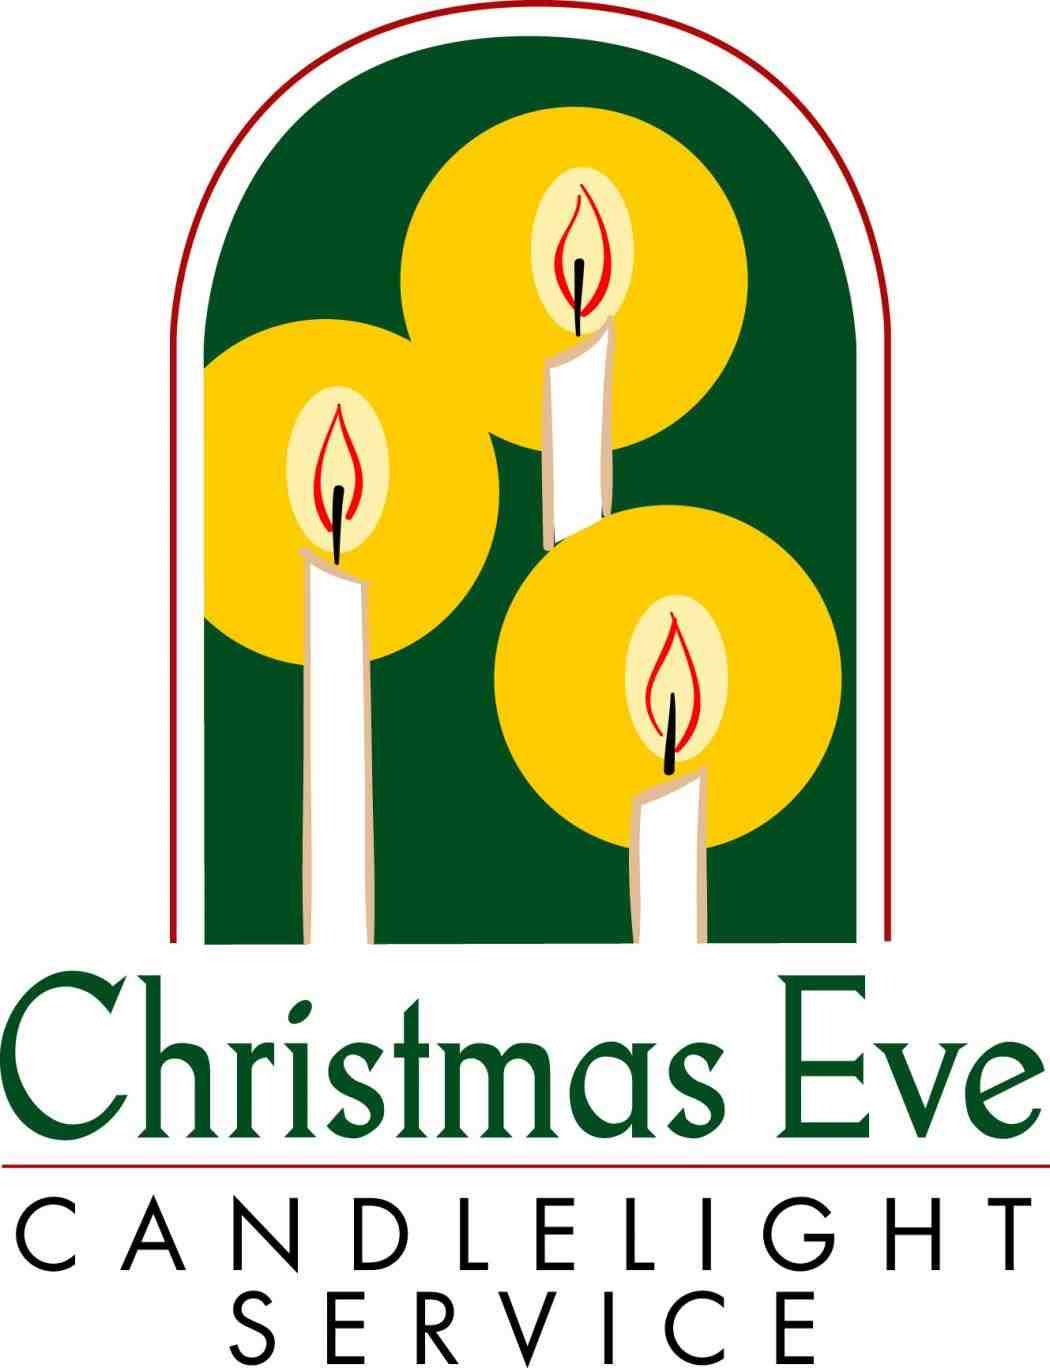 1050x1368 Religious Christmas Clipart Free Cheminee.website